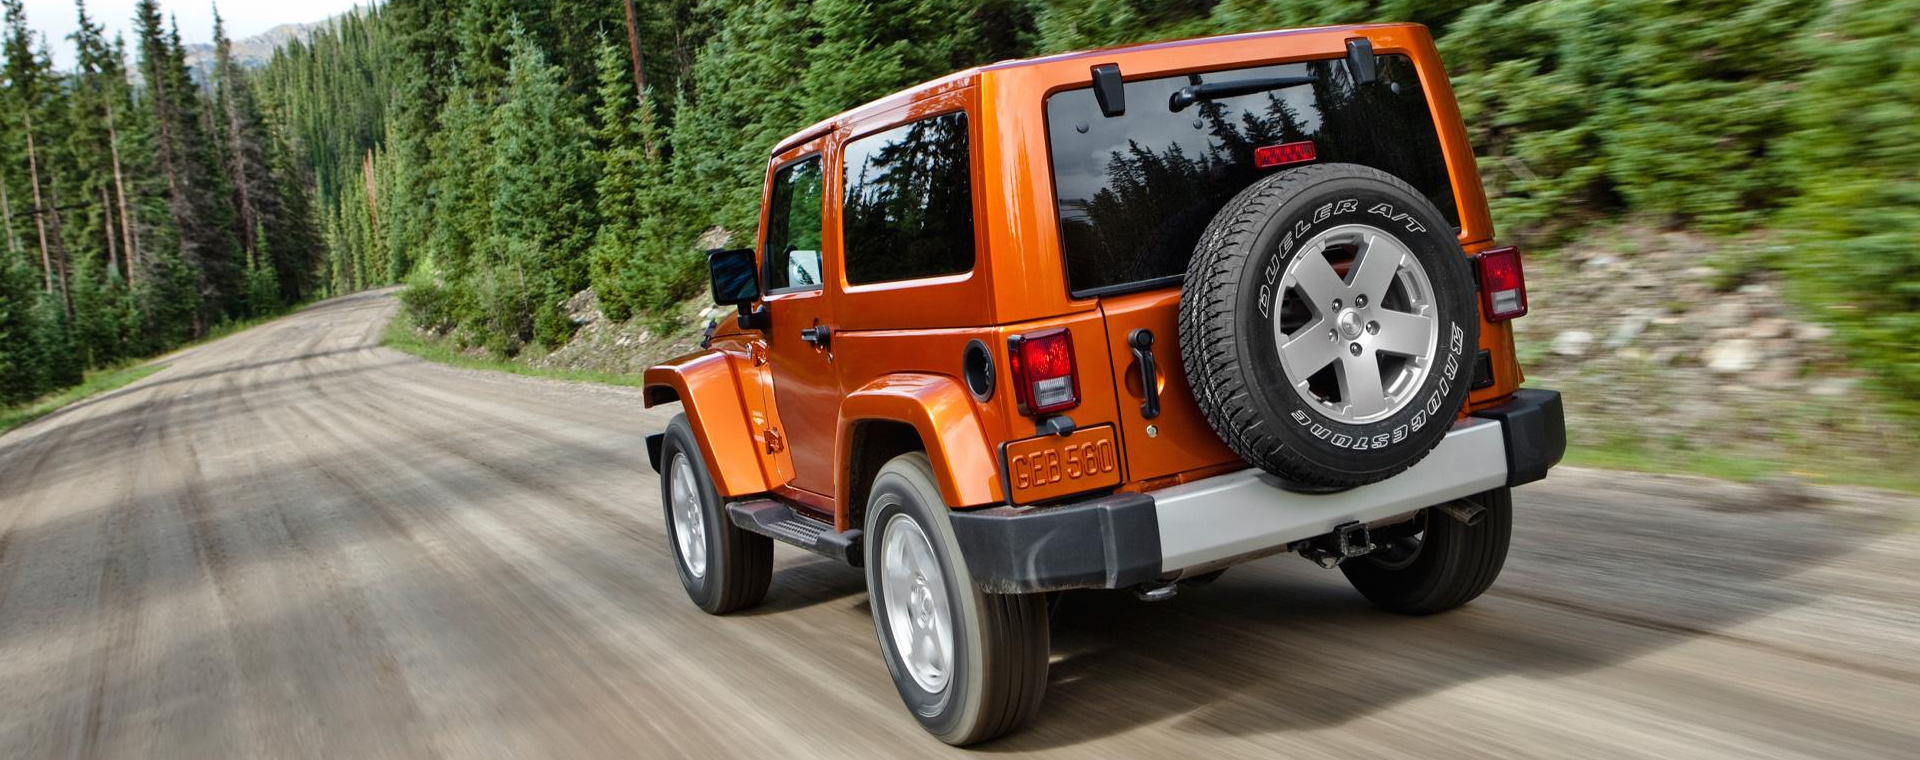 Jeep wrangler deals canada